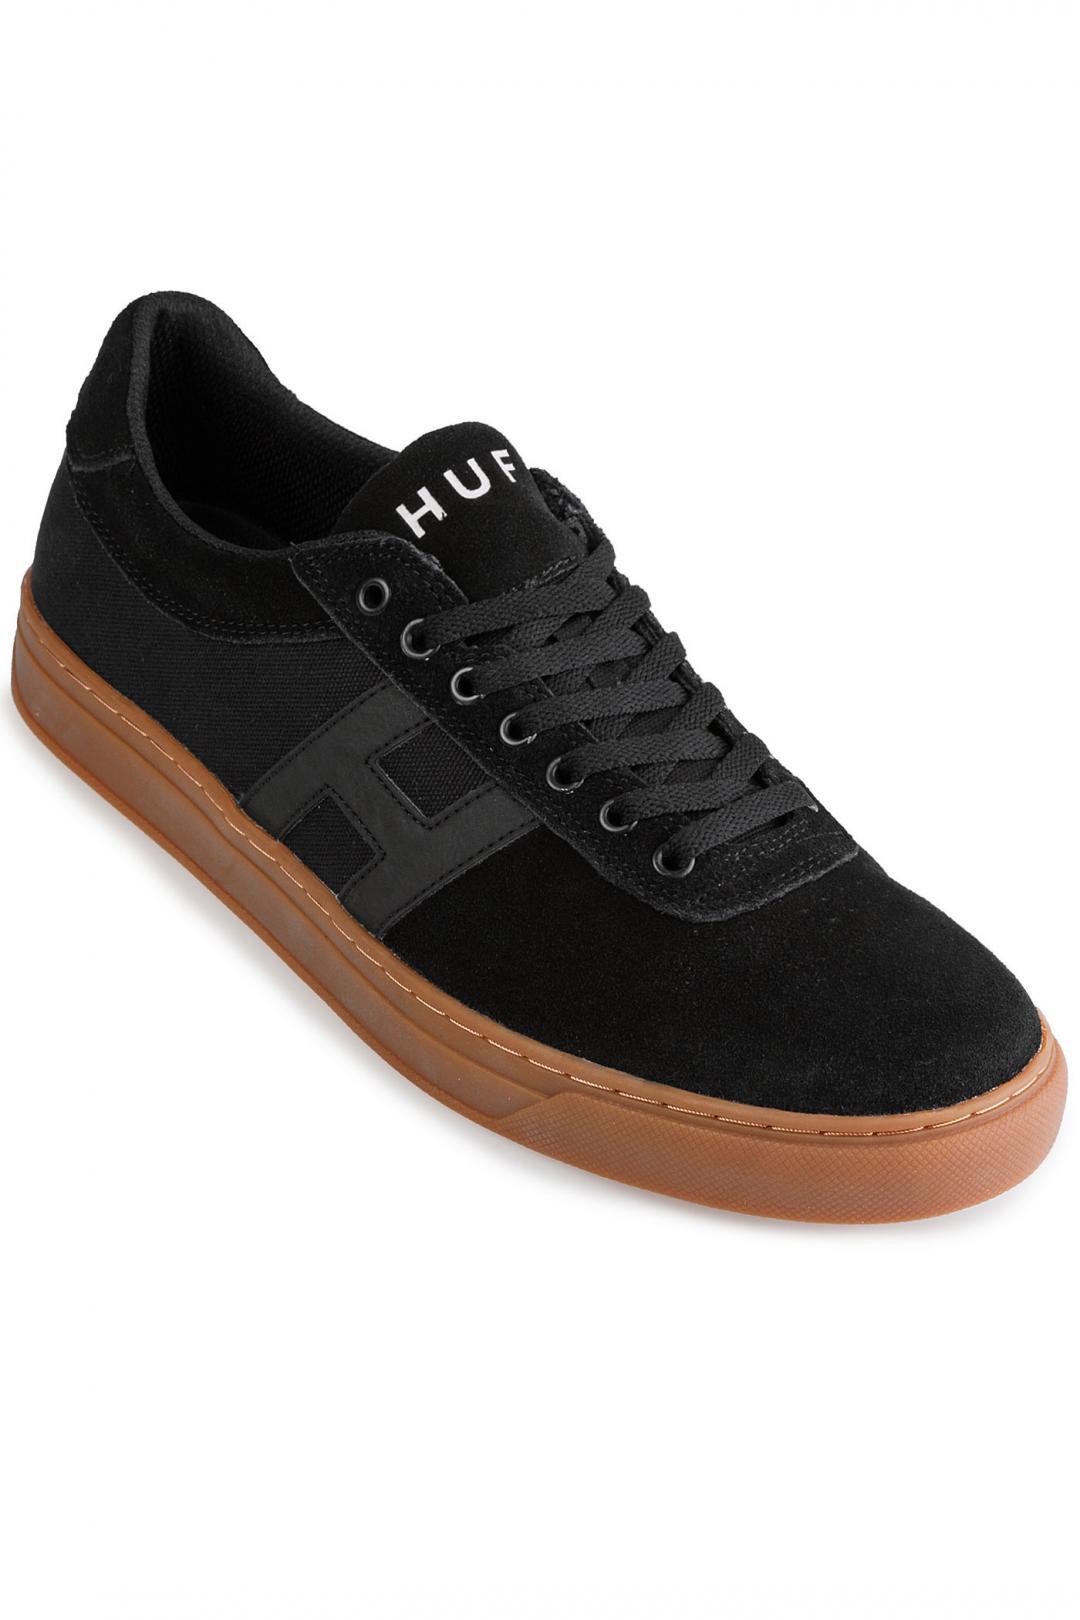 Uomo HUF Soto black gum 2 | Sneakers low top